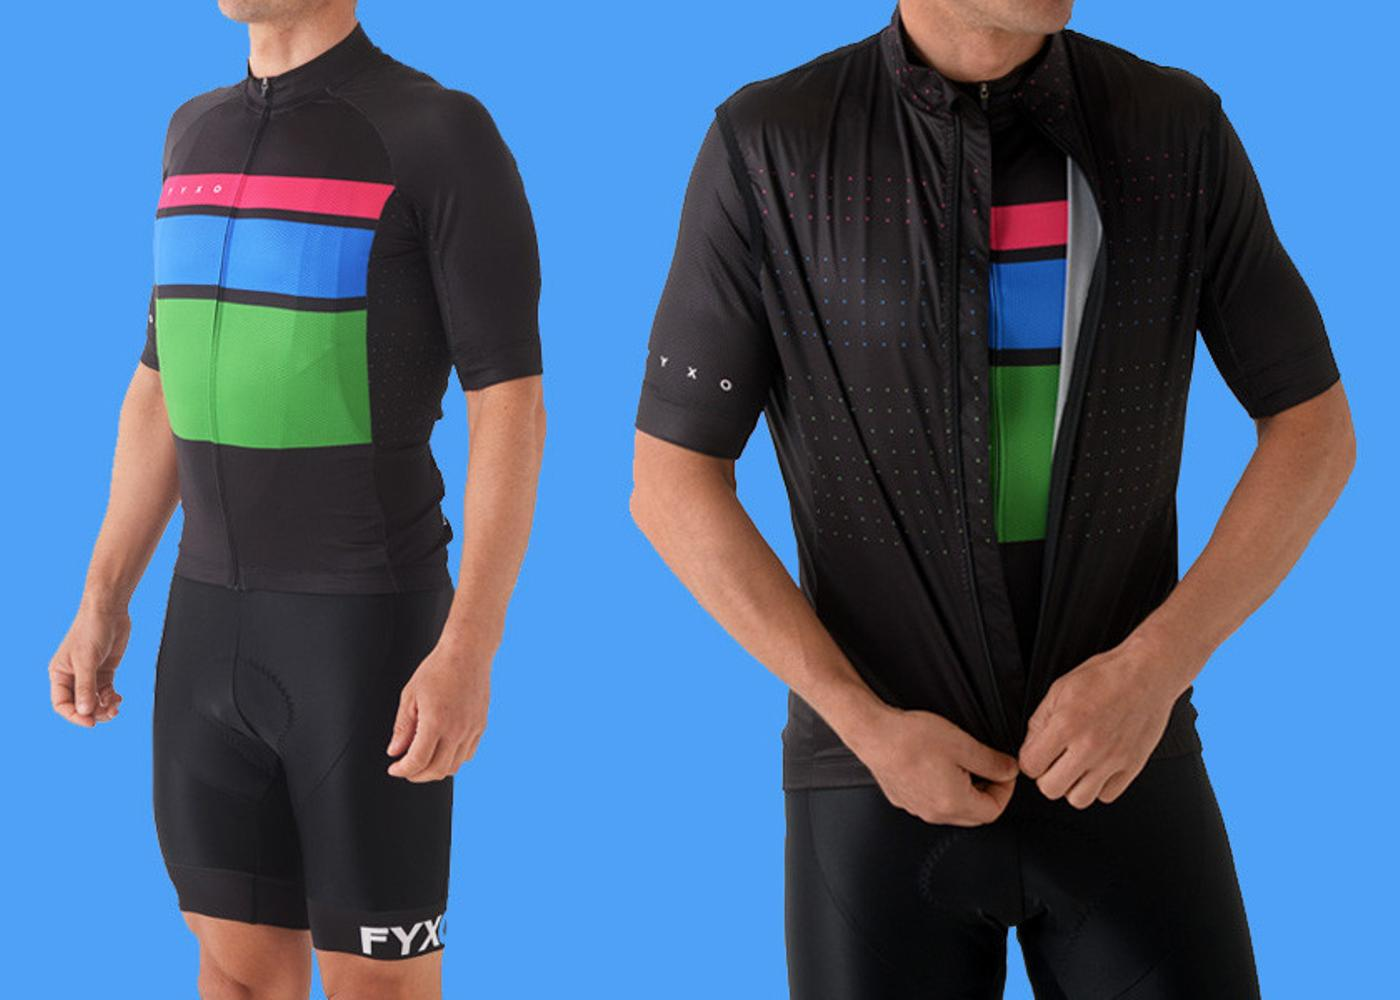 New FYXO Kit Designs